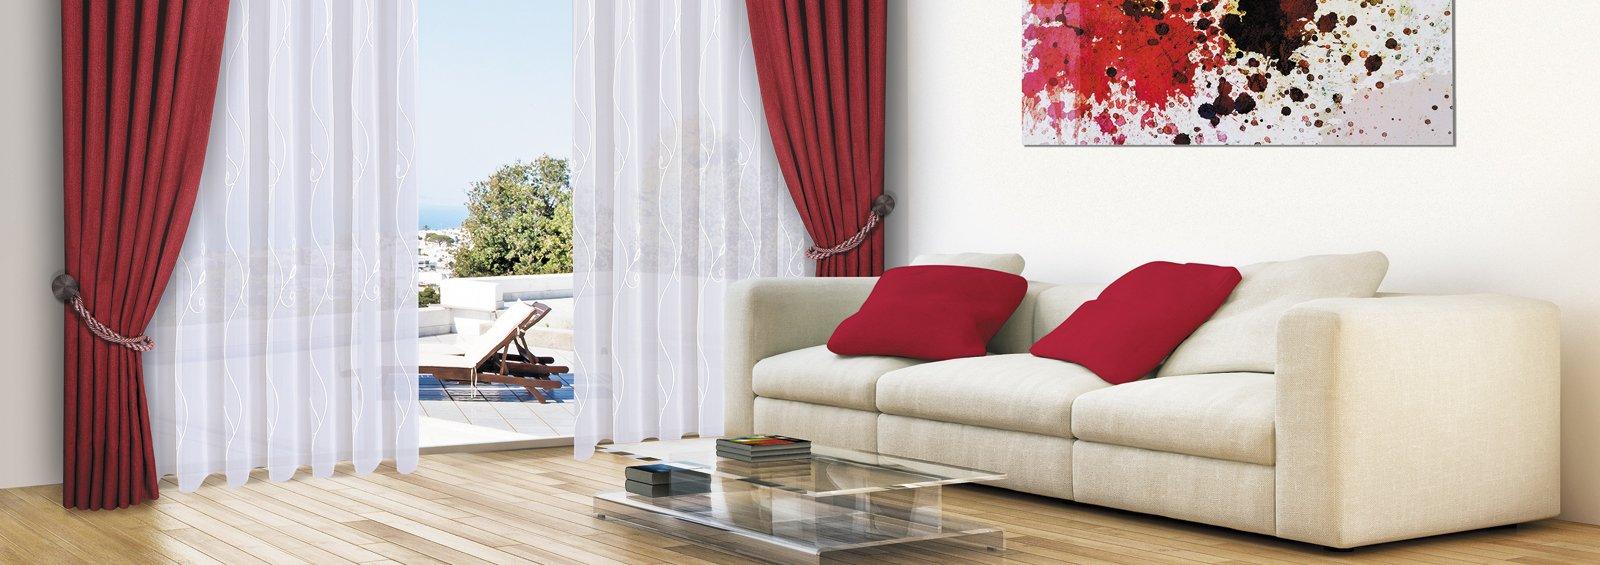 schlafzimmer gardinen katalog